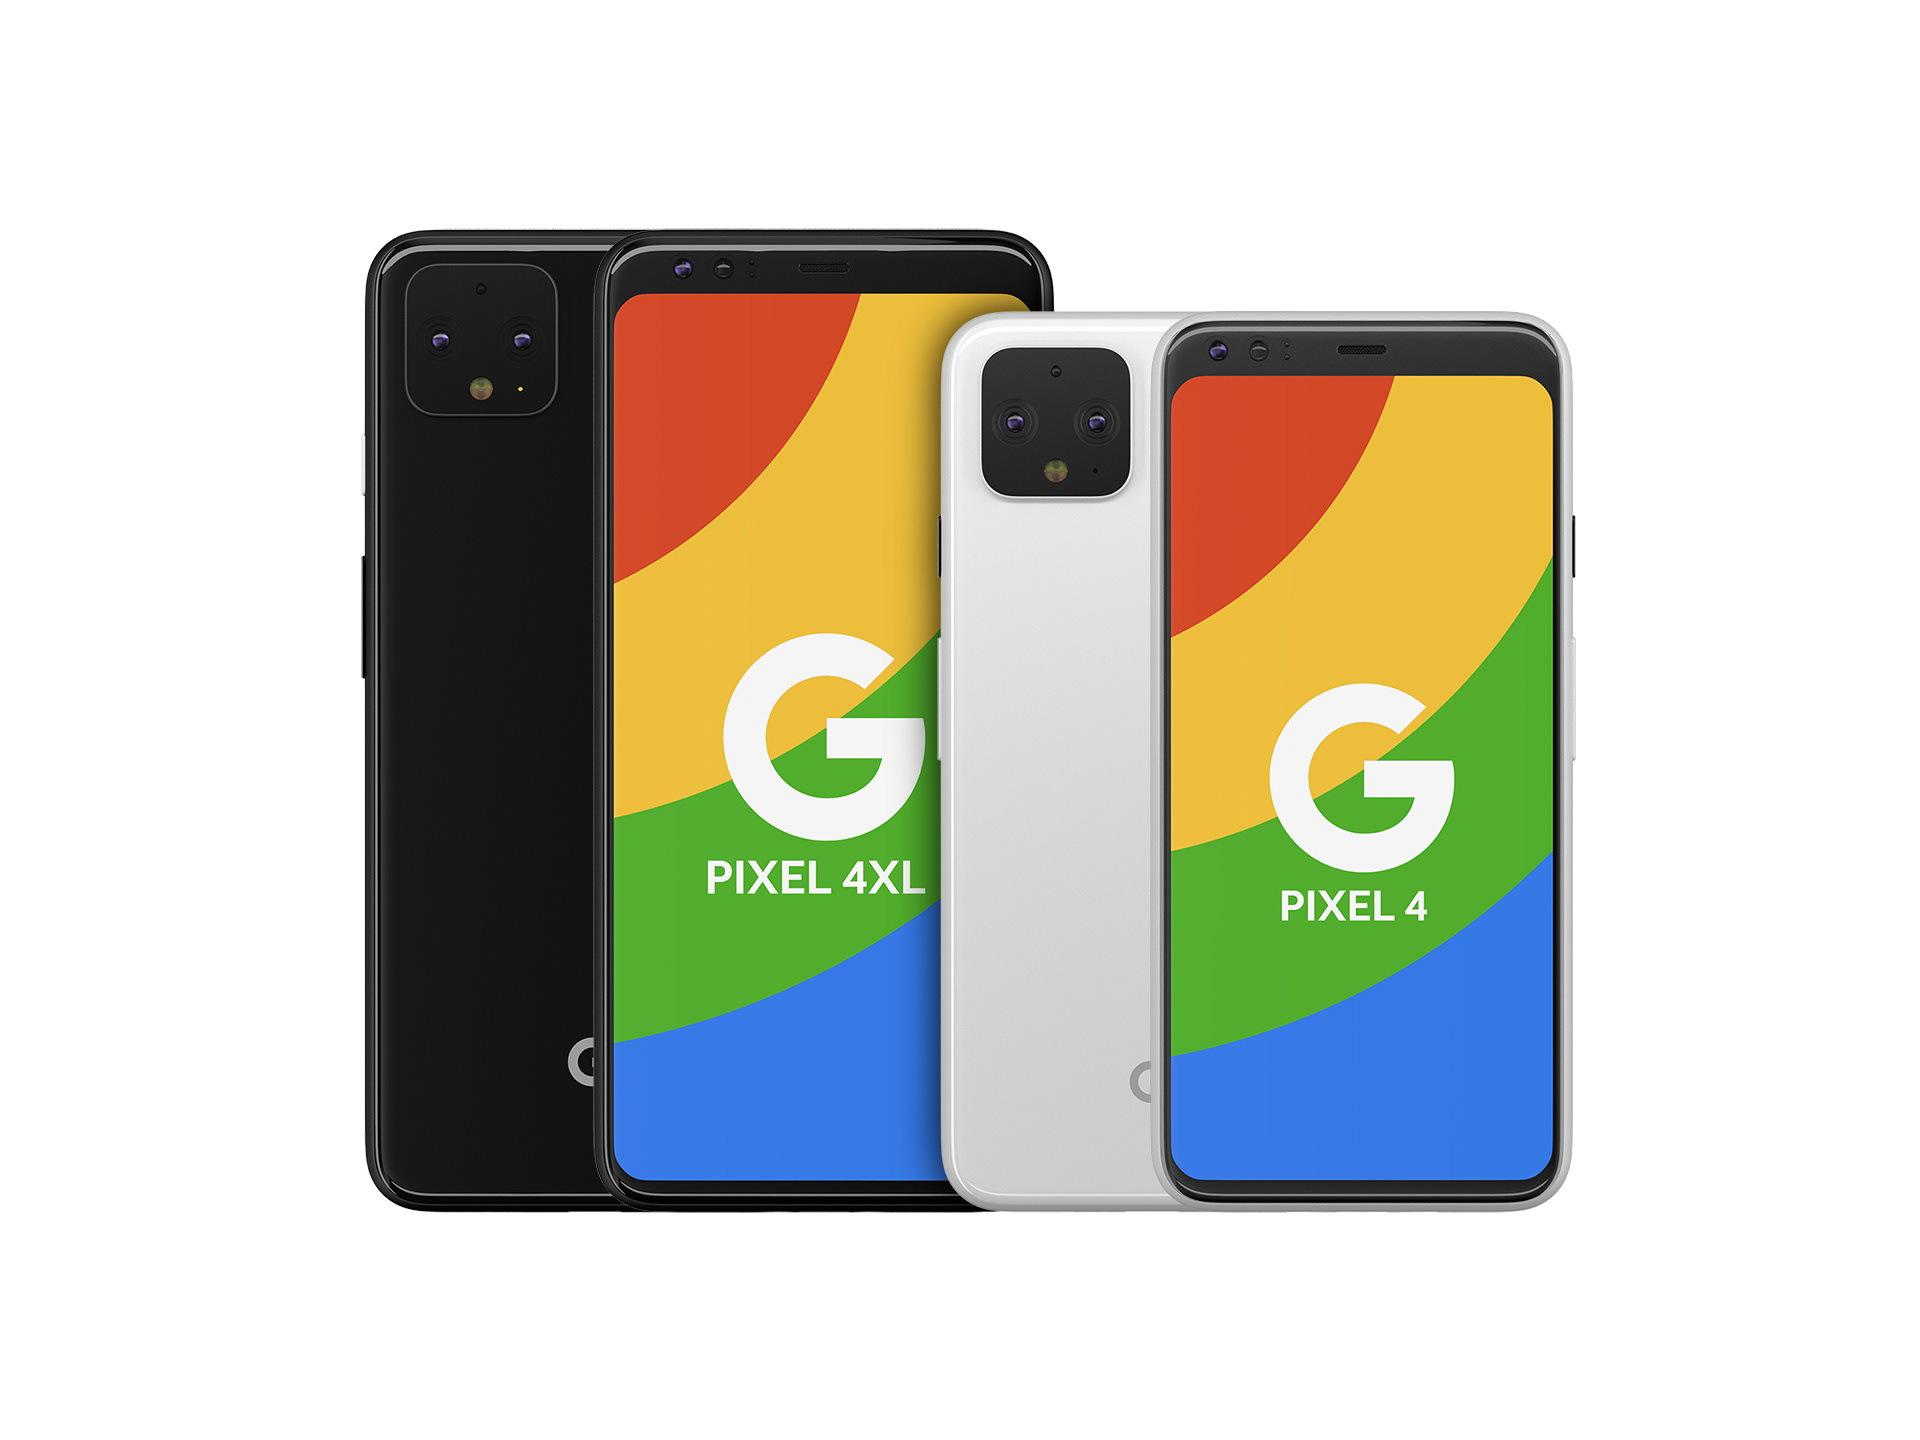 Google Pixel 4: Обзор и характеристики 7 - lenium.ru